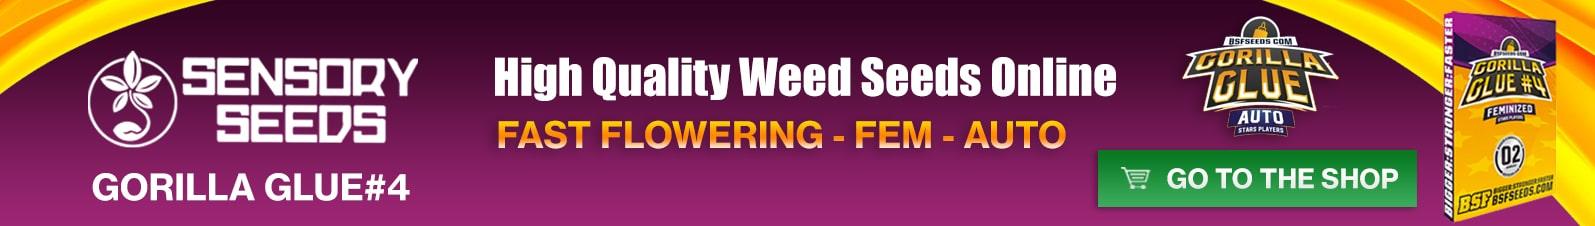 Banner Sensoryseeds Gorilla Glue cannabis seeds